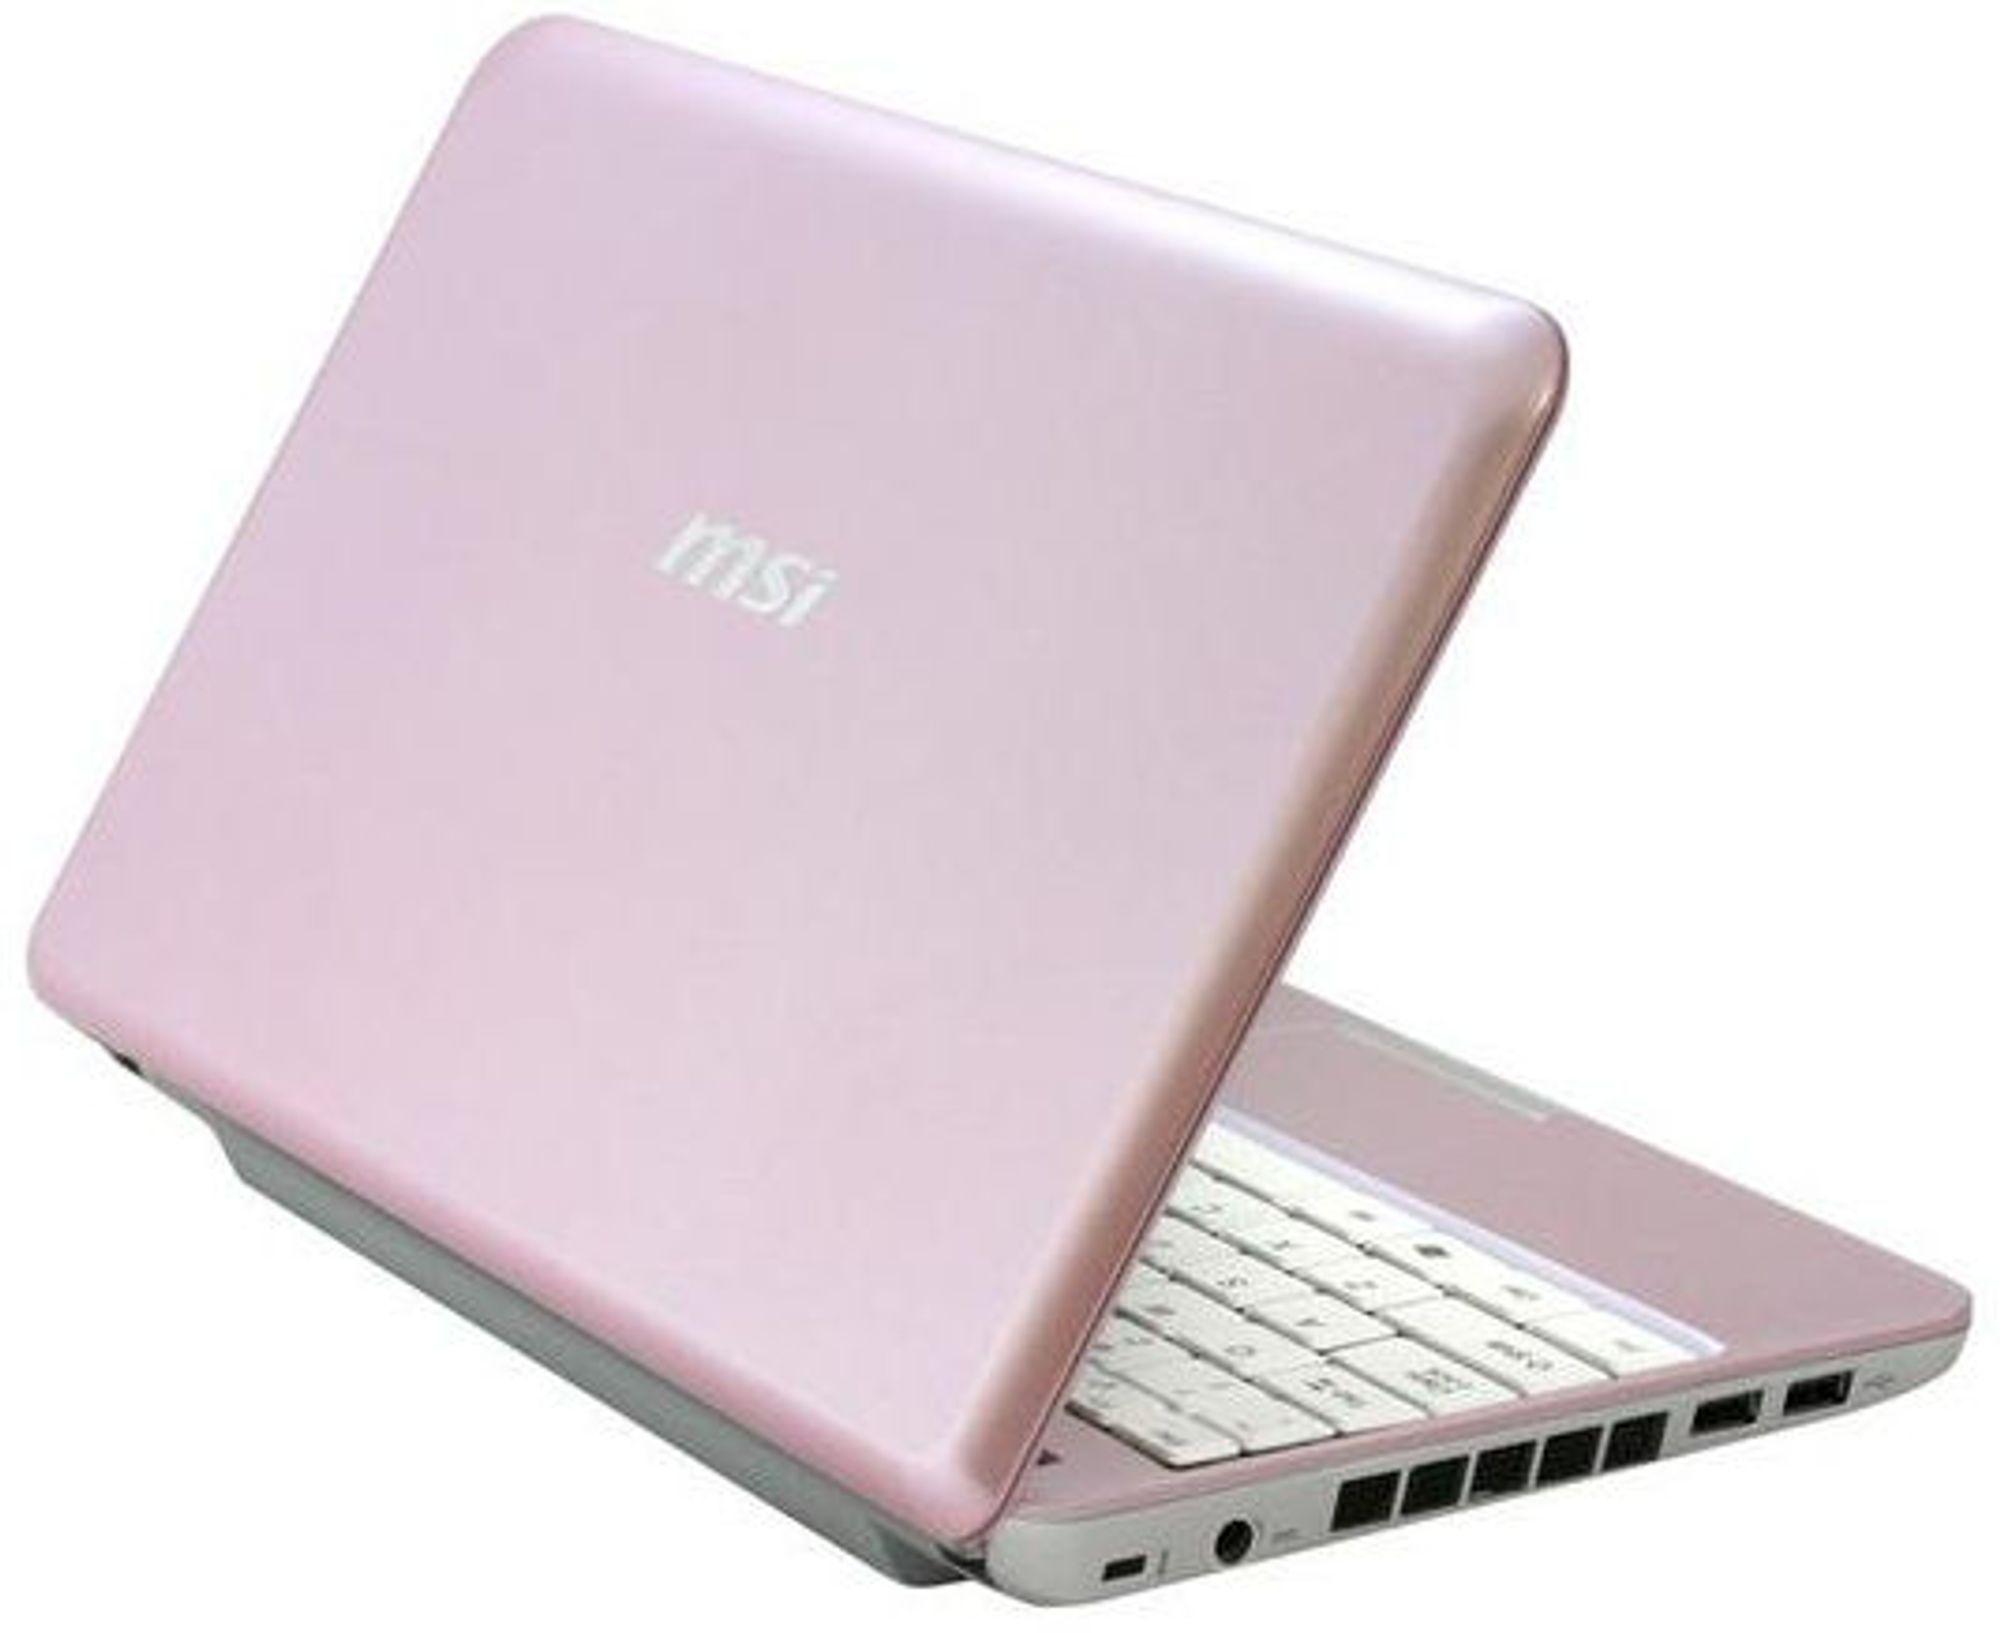 MSI Wind Notebook: Her i rosa drakt